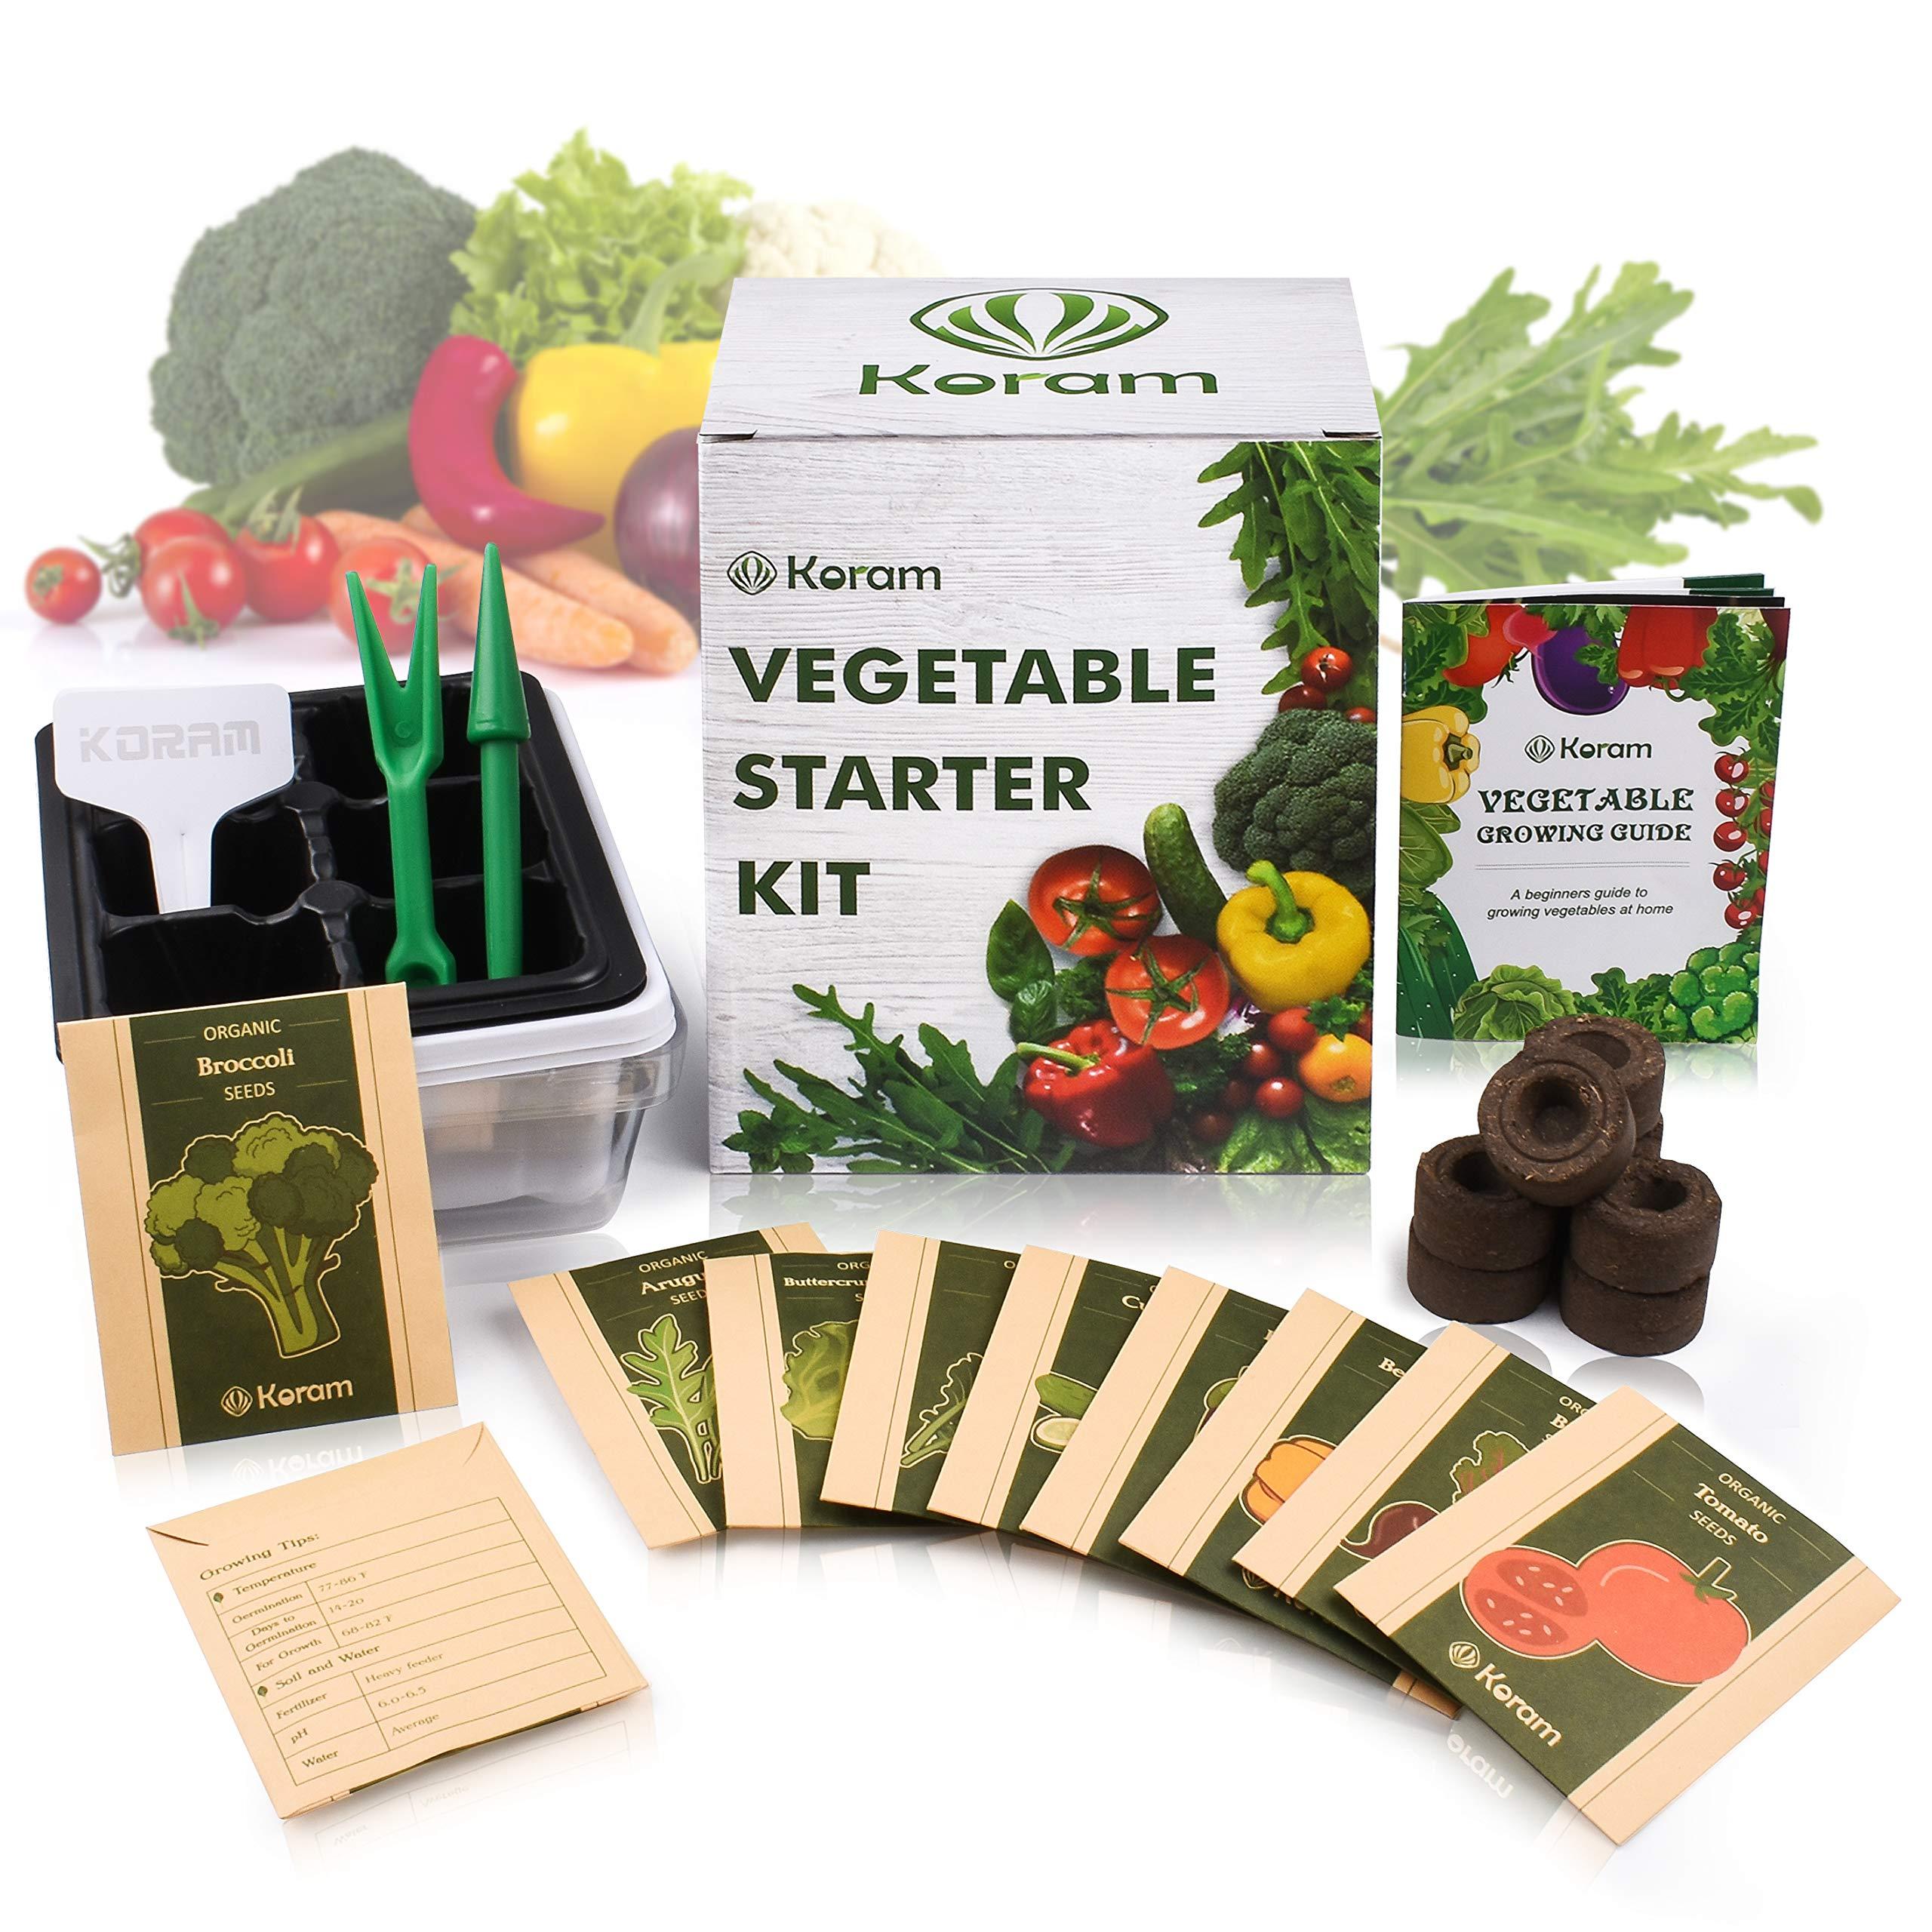 KORAM Vegetable Garden Starter Kit - 10 Organic Salad Seeds Organic Growing Kit DIY Gardening Starter Set with Everything a Gardener Needs for Growing Tomatoes Peppers Broccoli Cucumber Beets Kale by KORAM